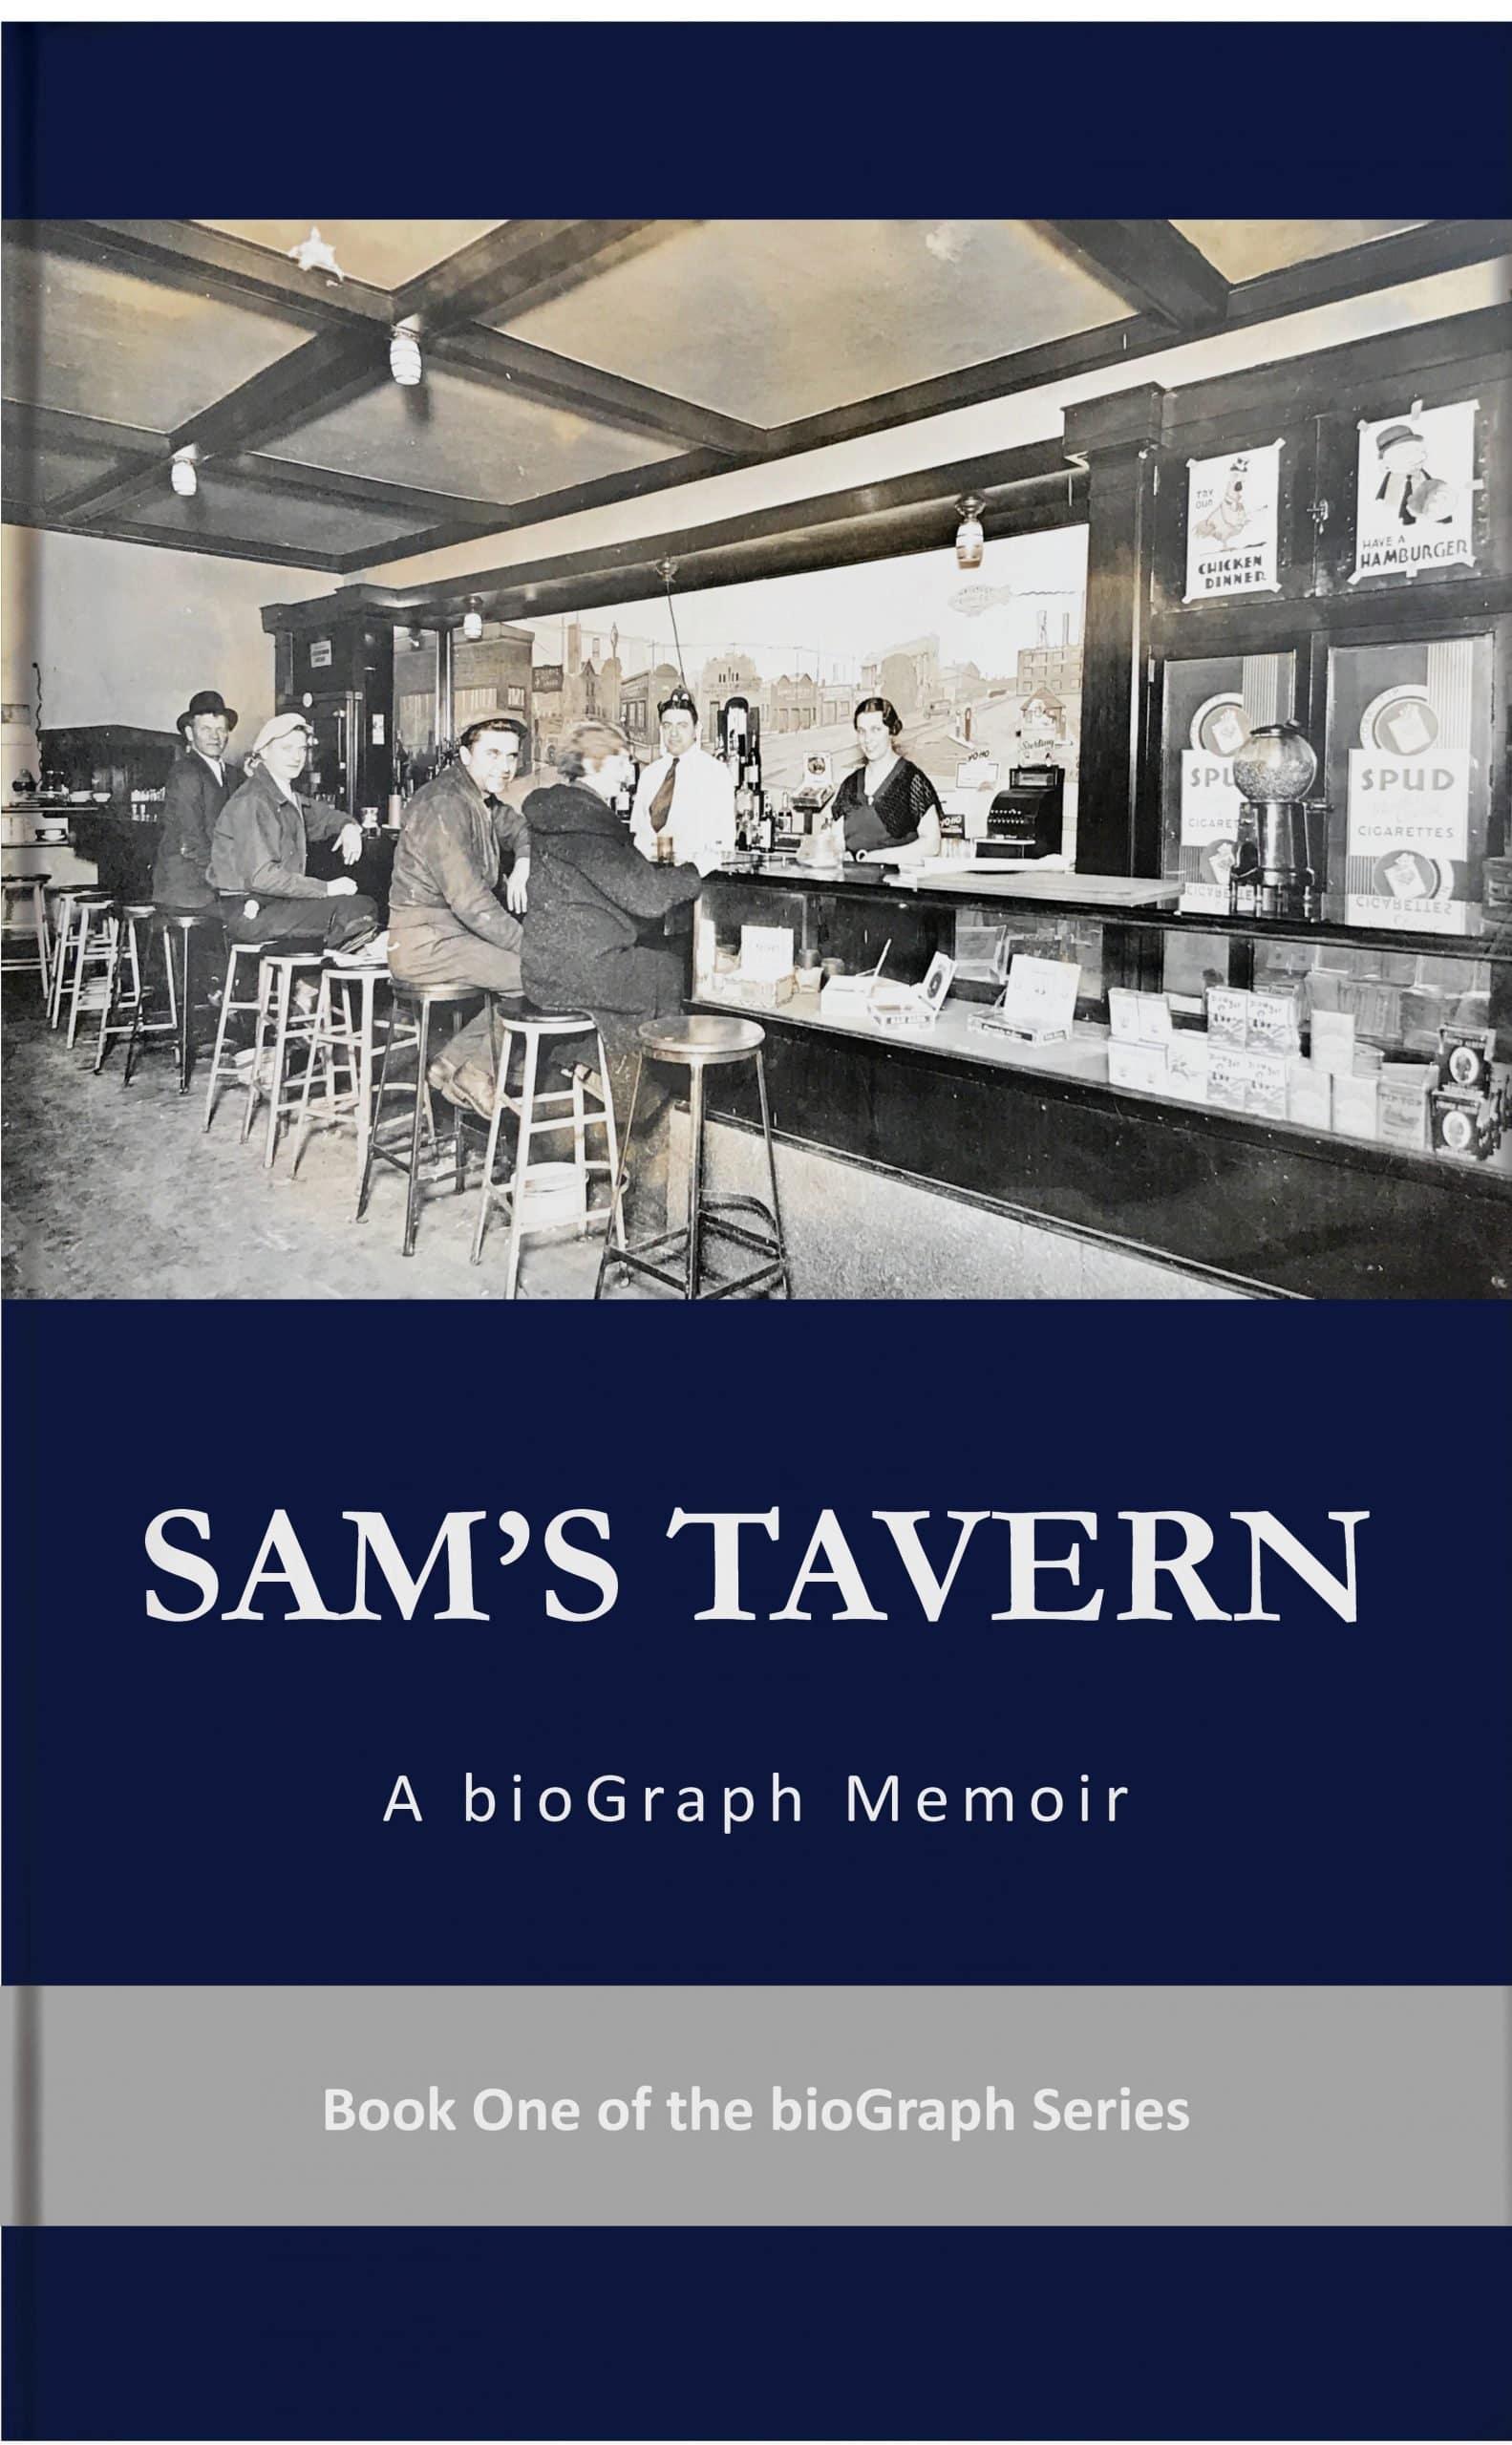 Sam's Tavern by Biograph